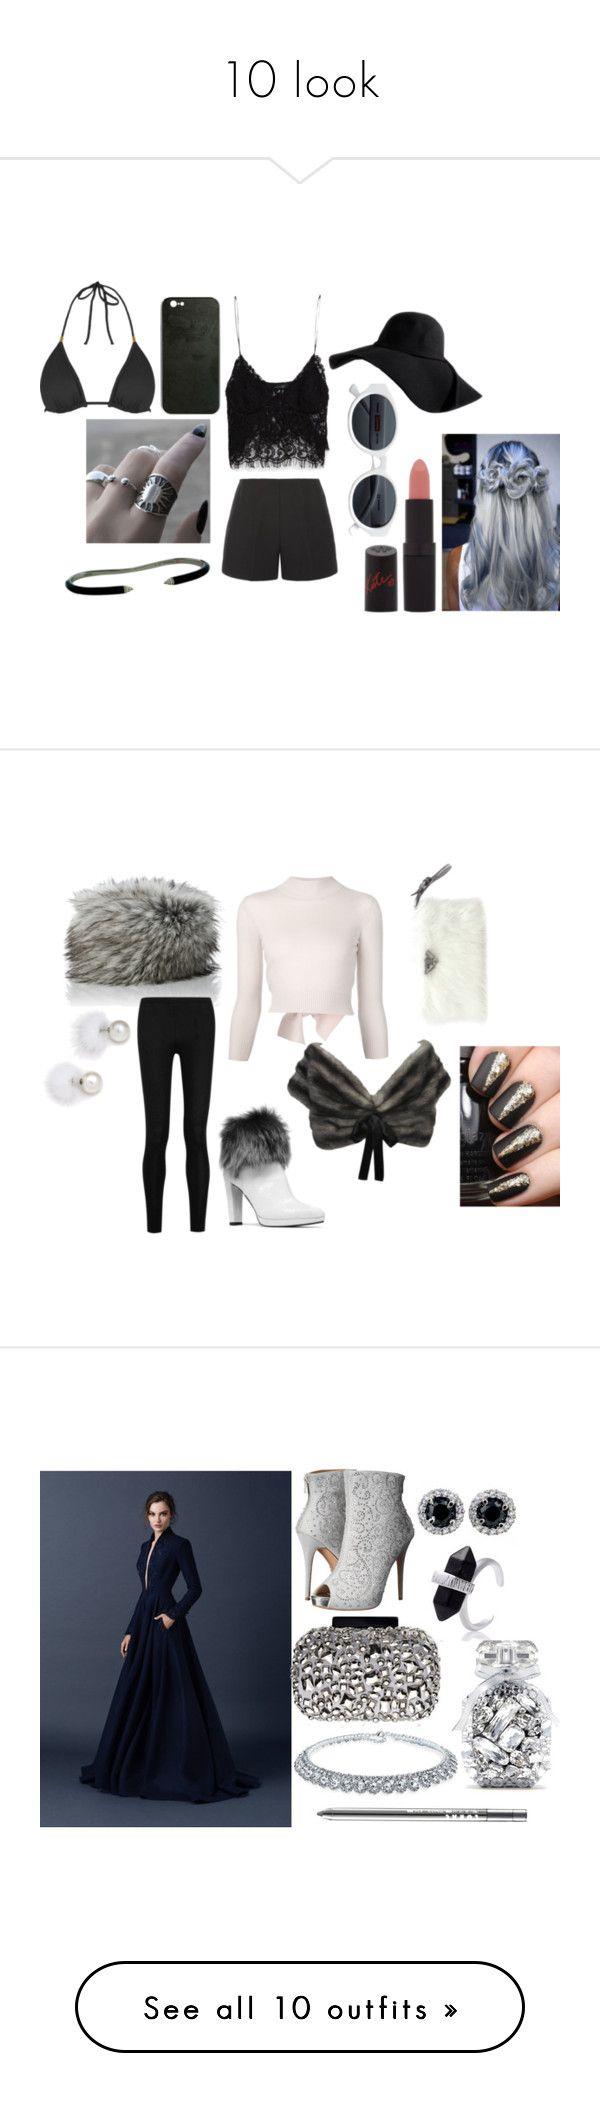 """10 look"" by gita-angesti on Polyvore featuring Zara, TIBI, Gaydamak, Rimmel, Topshop, women's clothing, women, female, woman and misses"